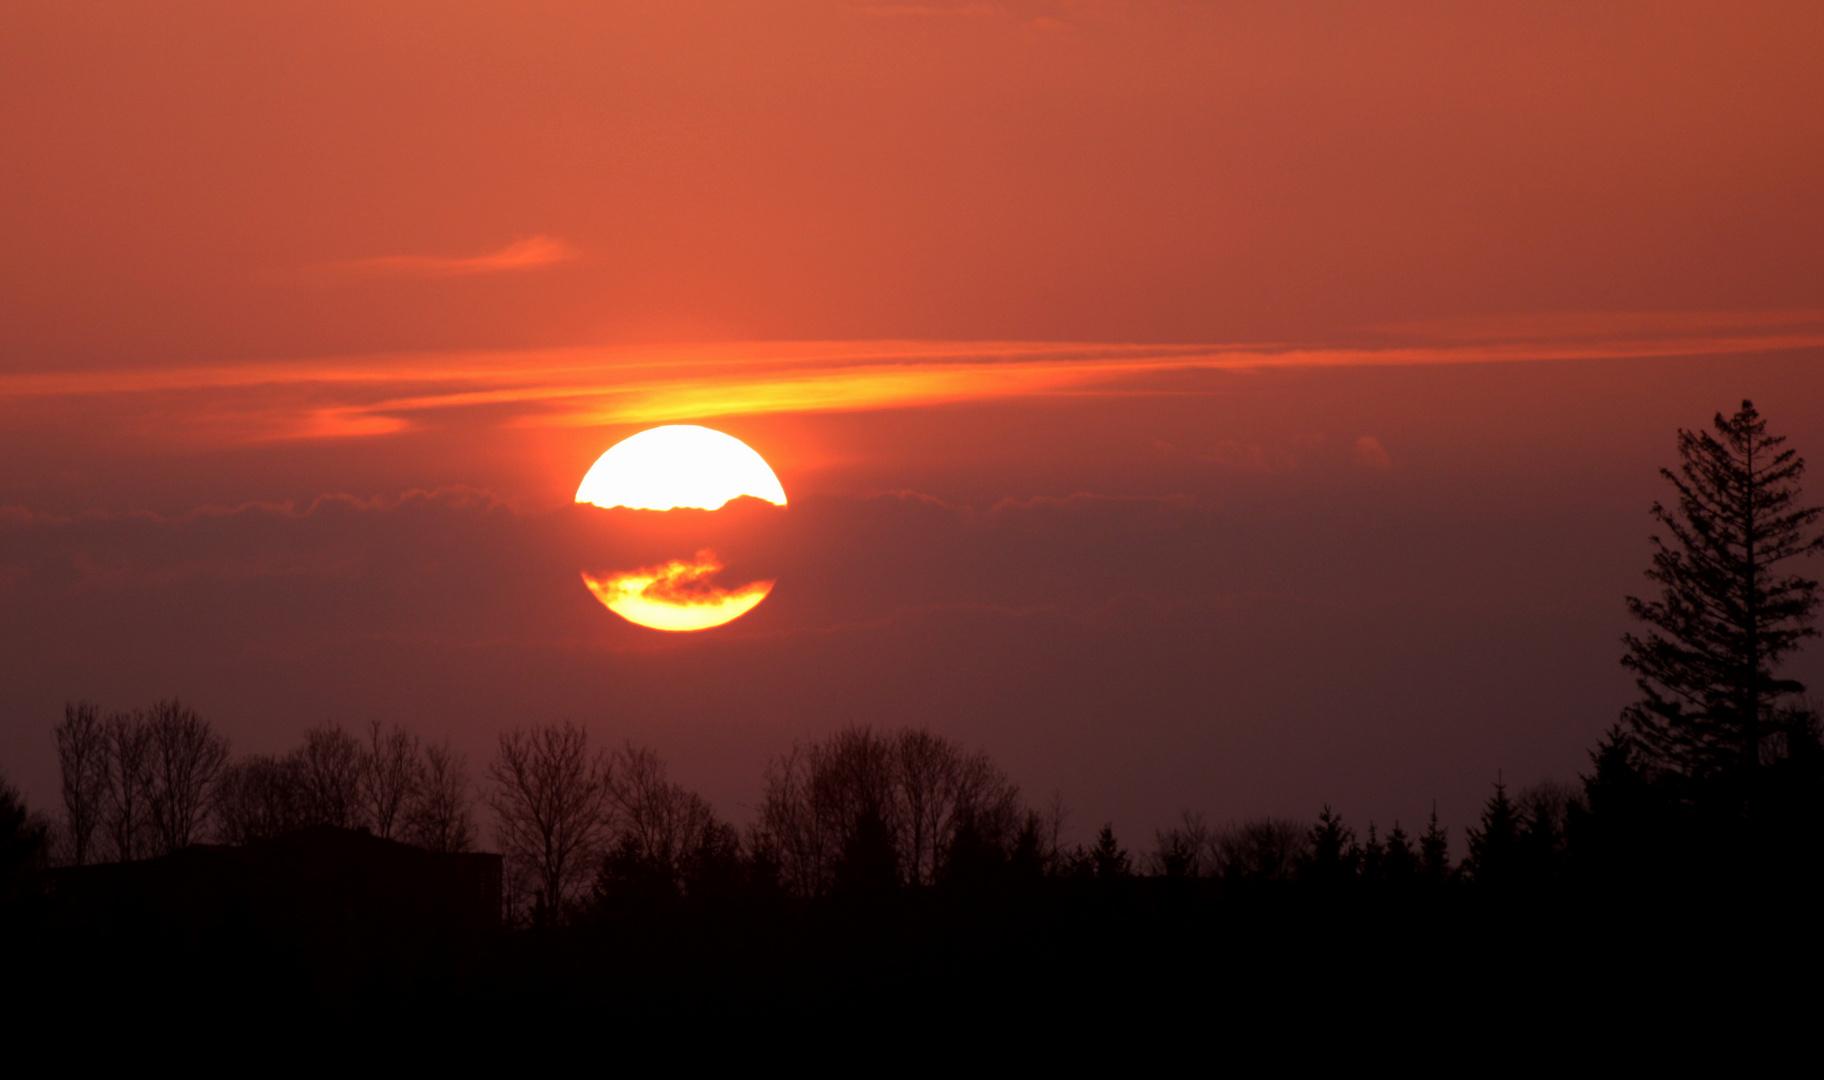 Sonnenuntergang im Vulkanstaub